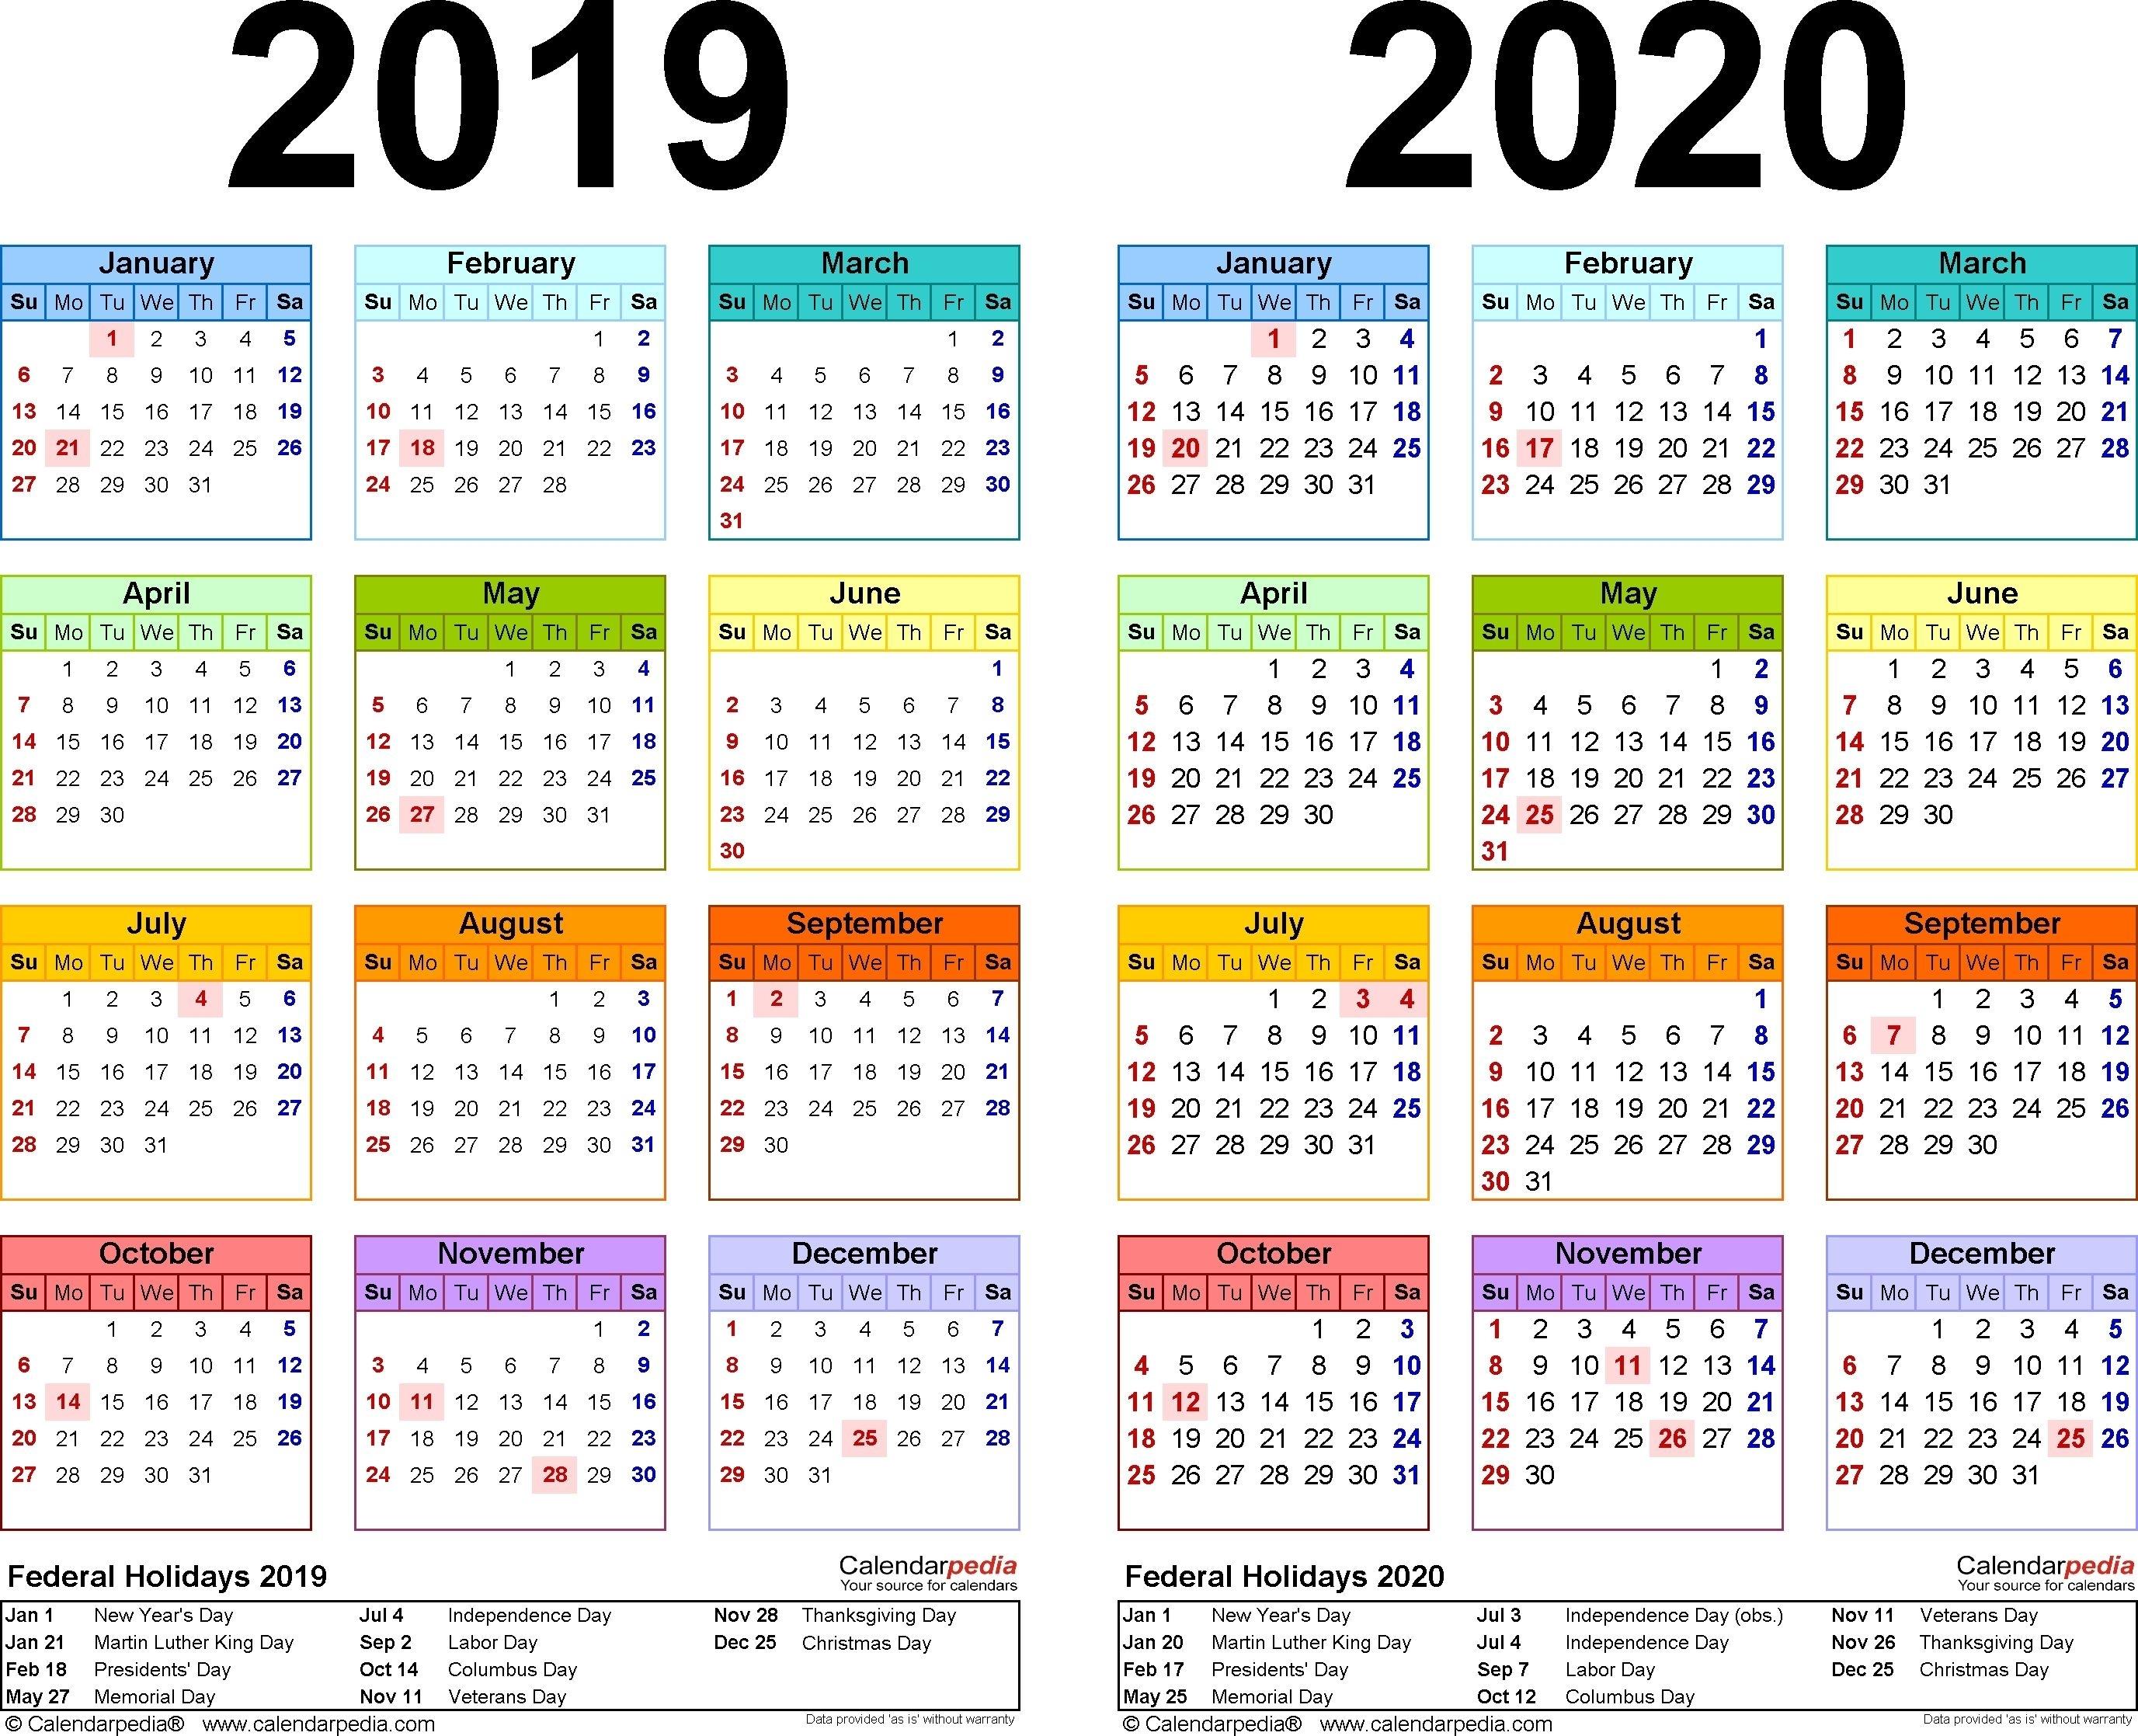 2019-2020 Calendar - Free Printable Two-Year Pdf Calendars in Microsoft Word Calendar Template 2019-2020